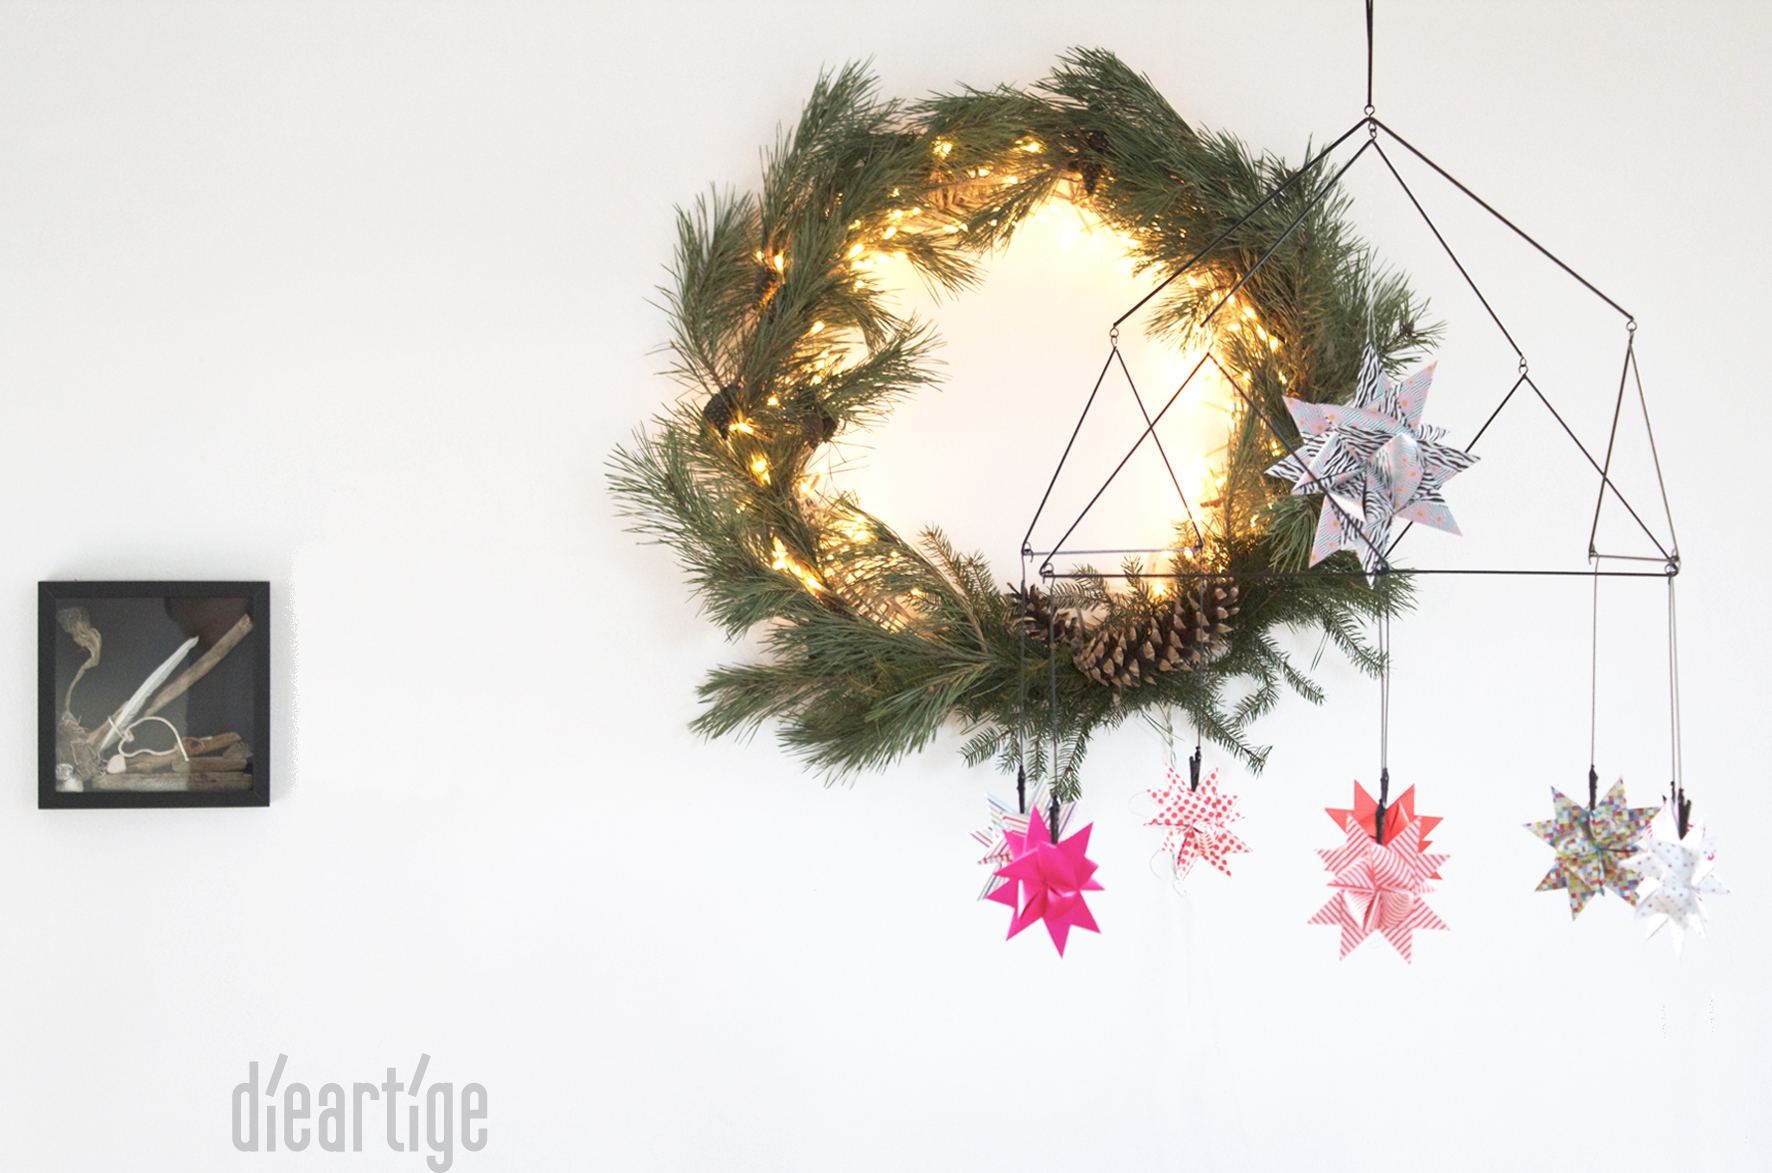 dieartigeBLOG - Kiefernkranz + Fröbelmobile, Advent, Dekoration, Fröbelsterne in Neonfarben